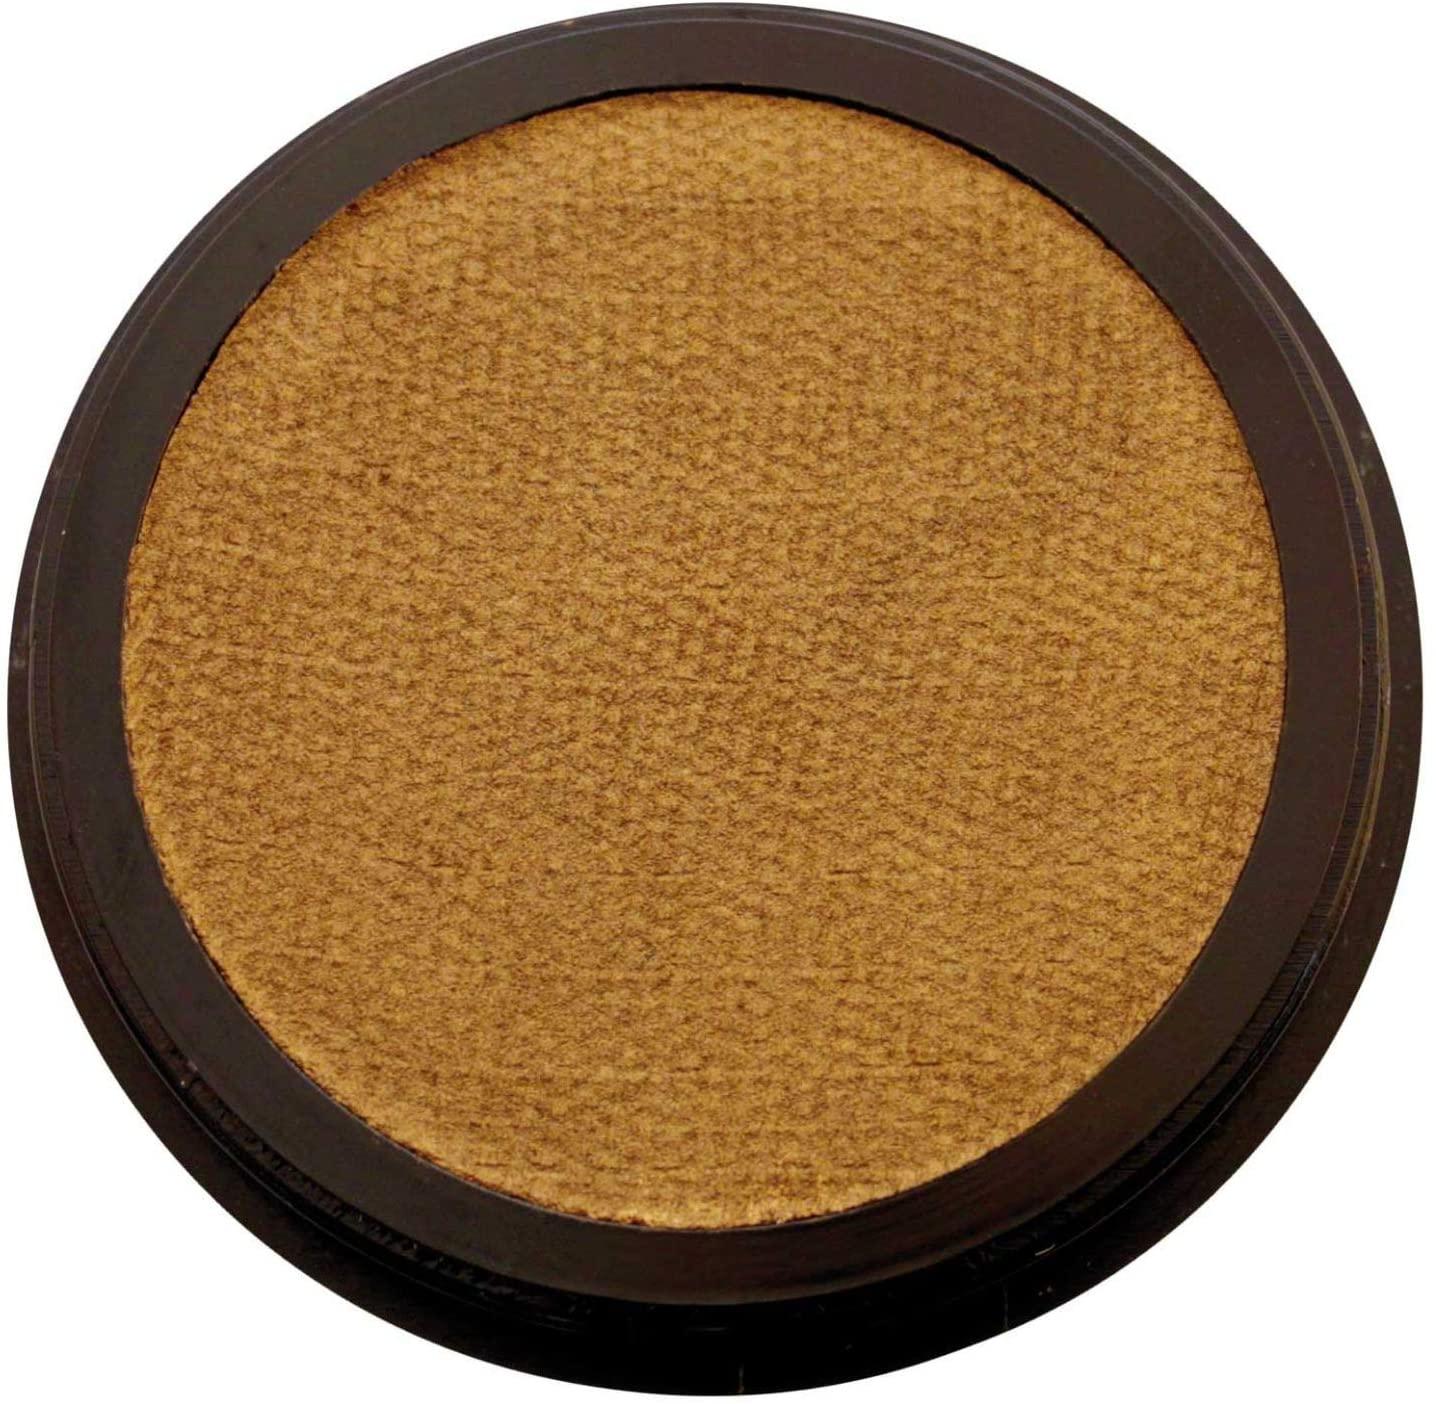 Creative Eulenspiegel 180761 Pearlised Bronze 20 ml/30 g Professional Aqua Make-Up